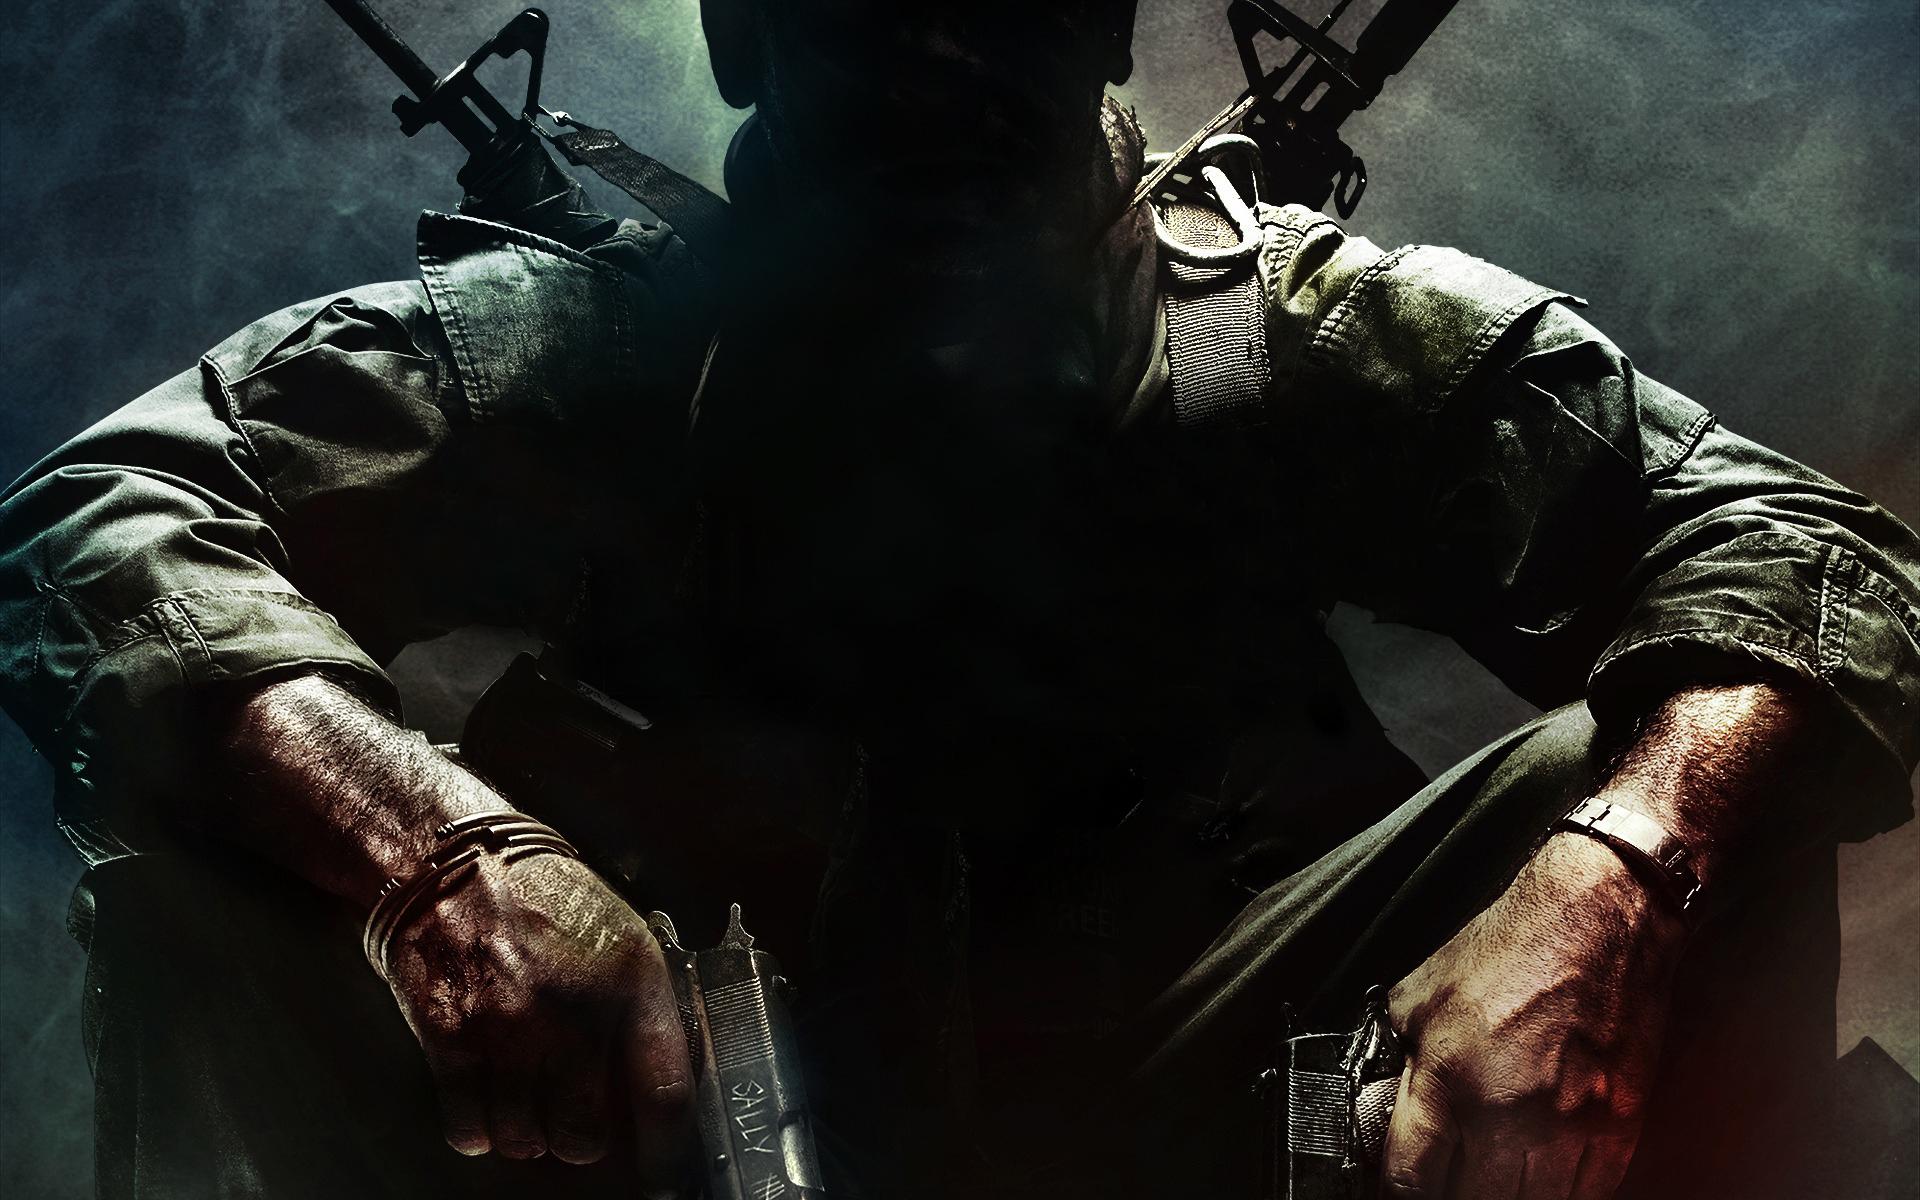 Call Of Duty: Black Ops Computer Wallpapers, Desktop Backgrounds